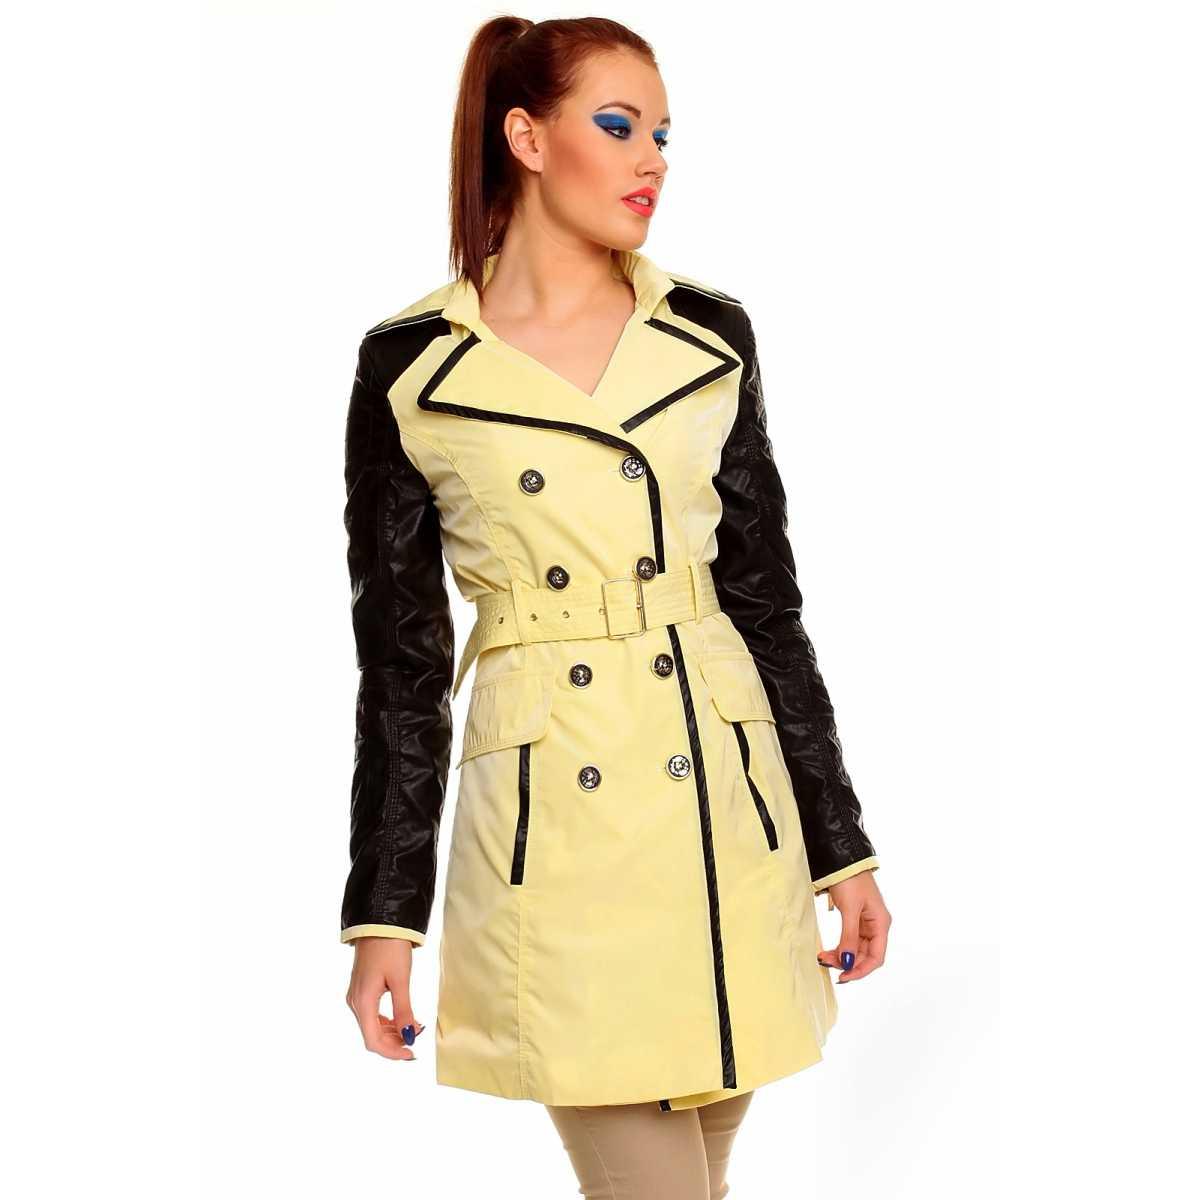 Trenci galben din tercot, modern, cu maneci negre trench dama